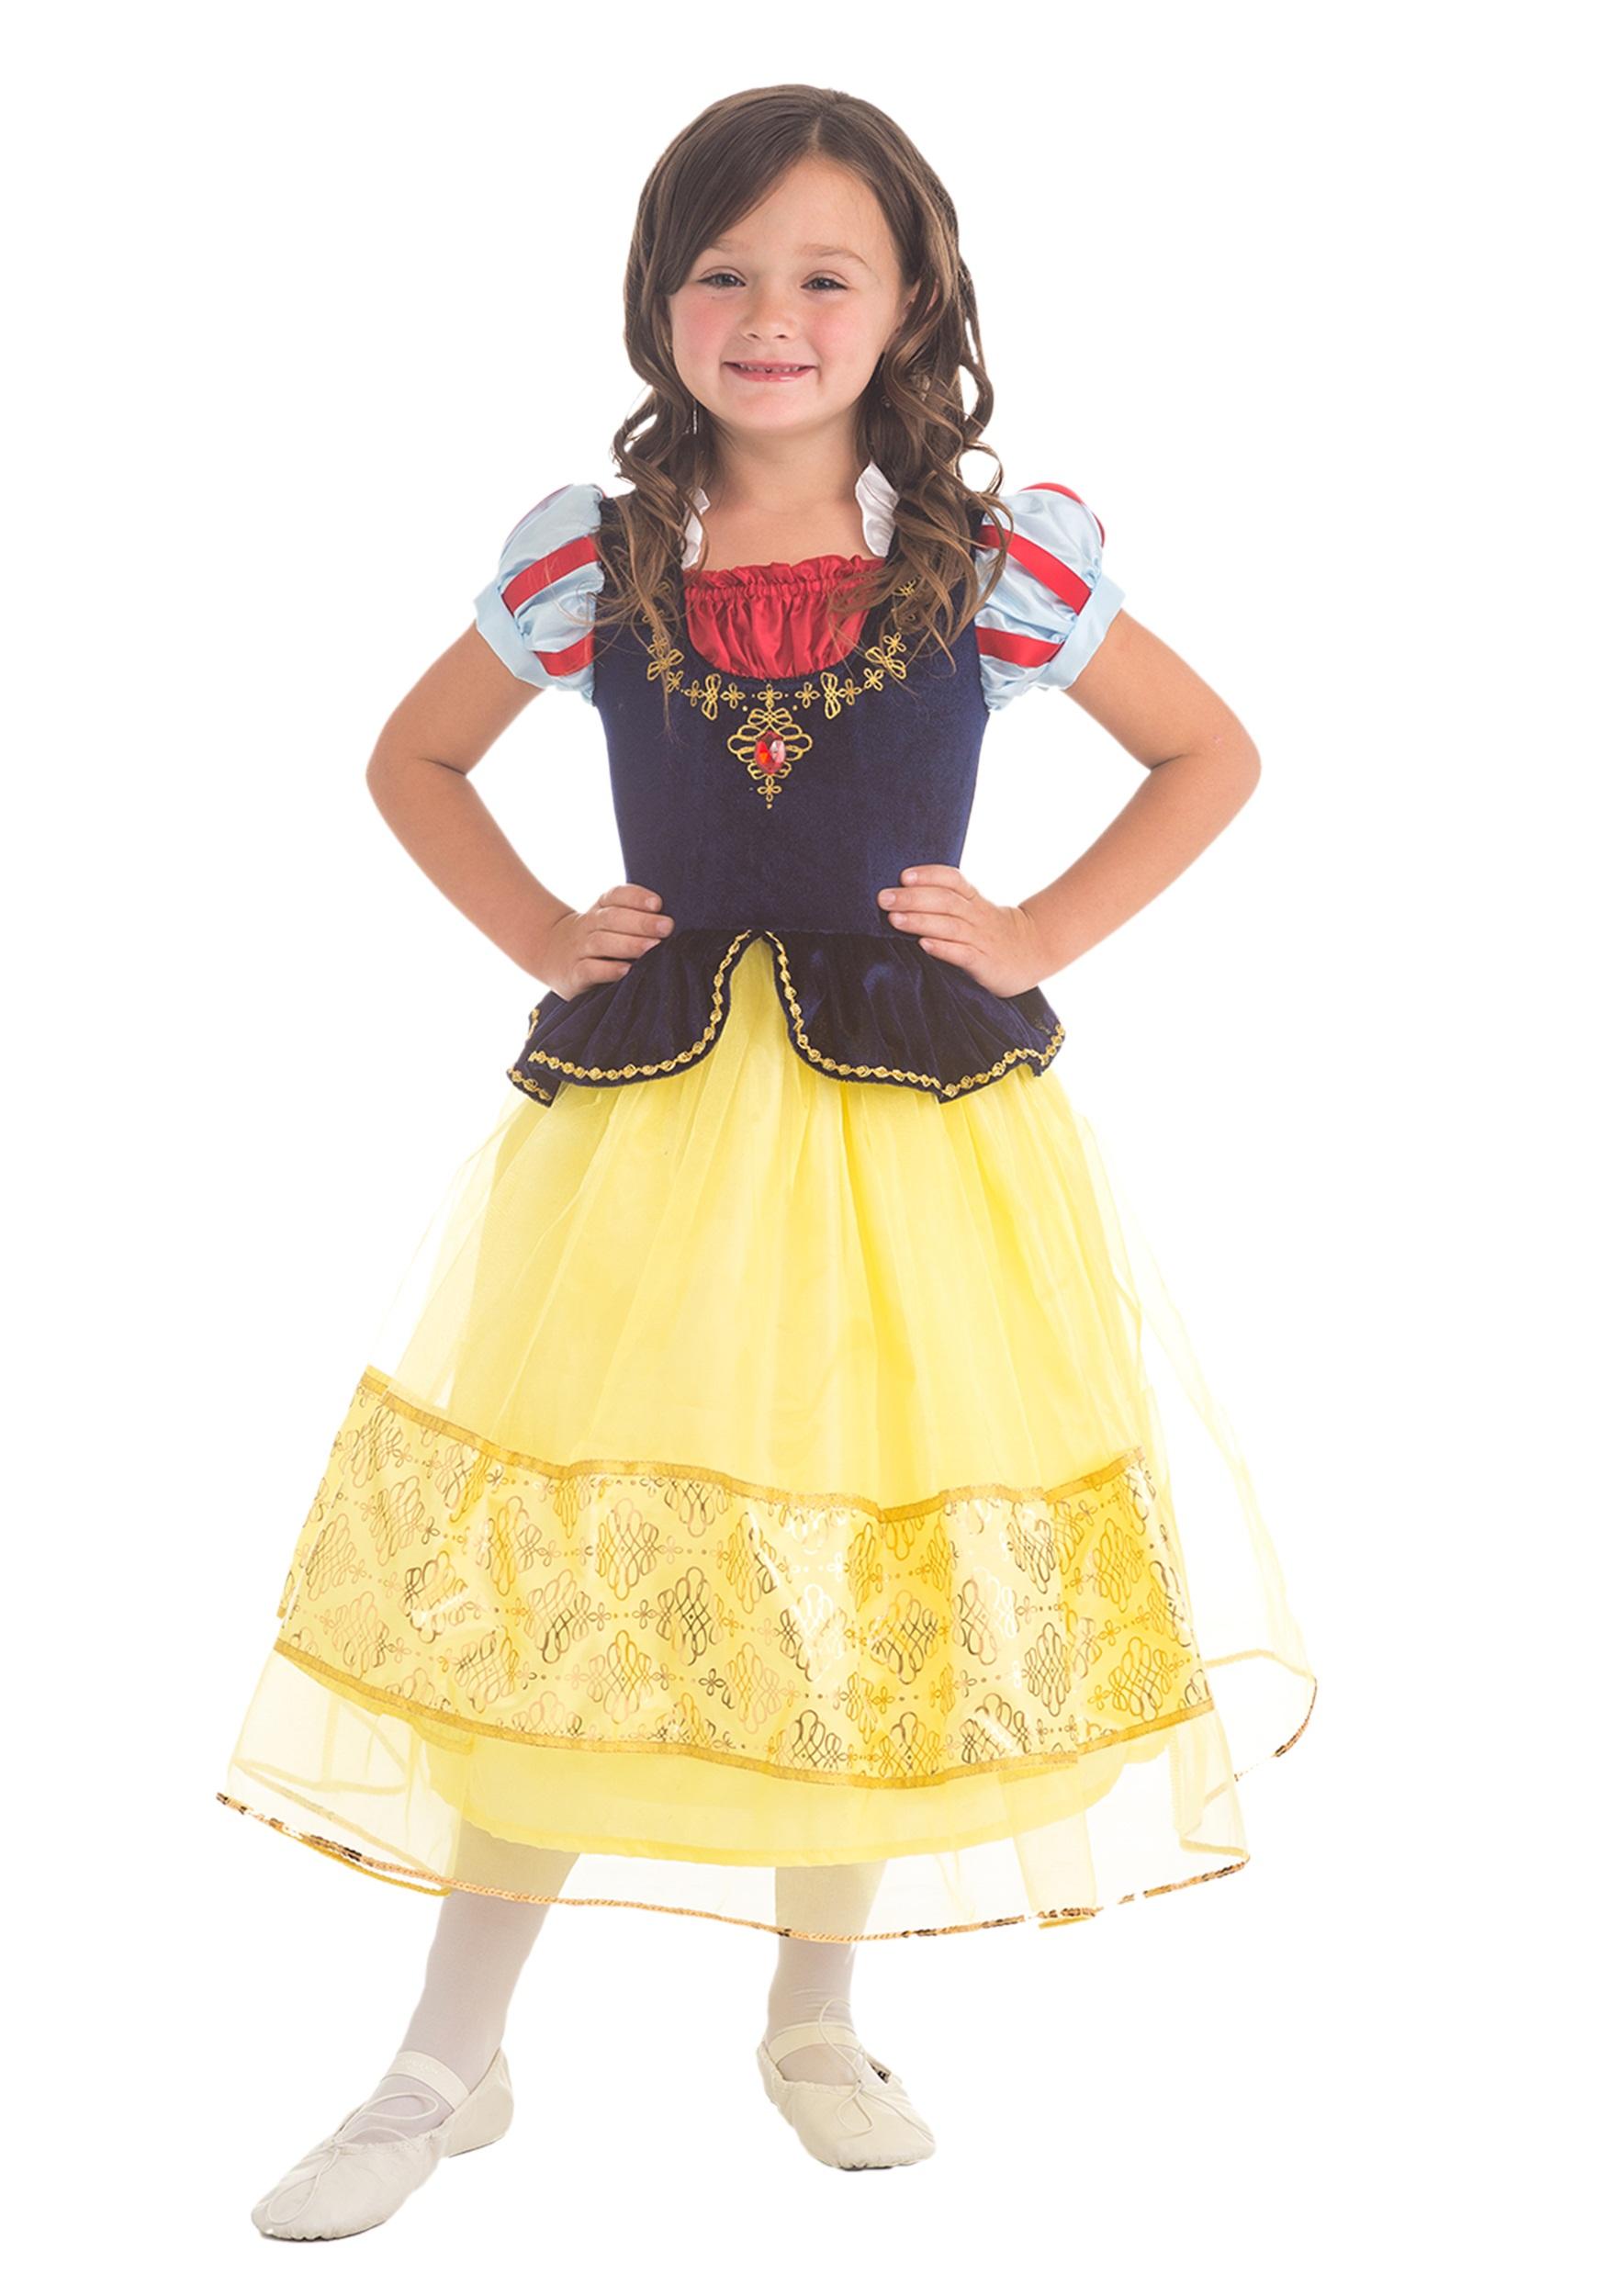 Girls Snow White Costume  sc 1 st  Halloween Costumes & Girls Snow White Costume - Halloween Costumes